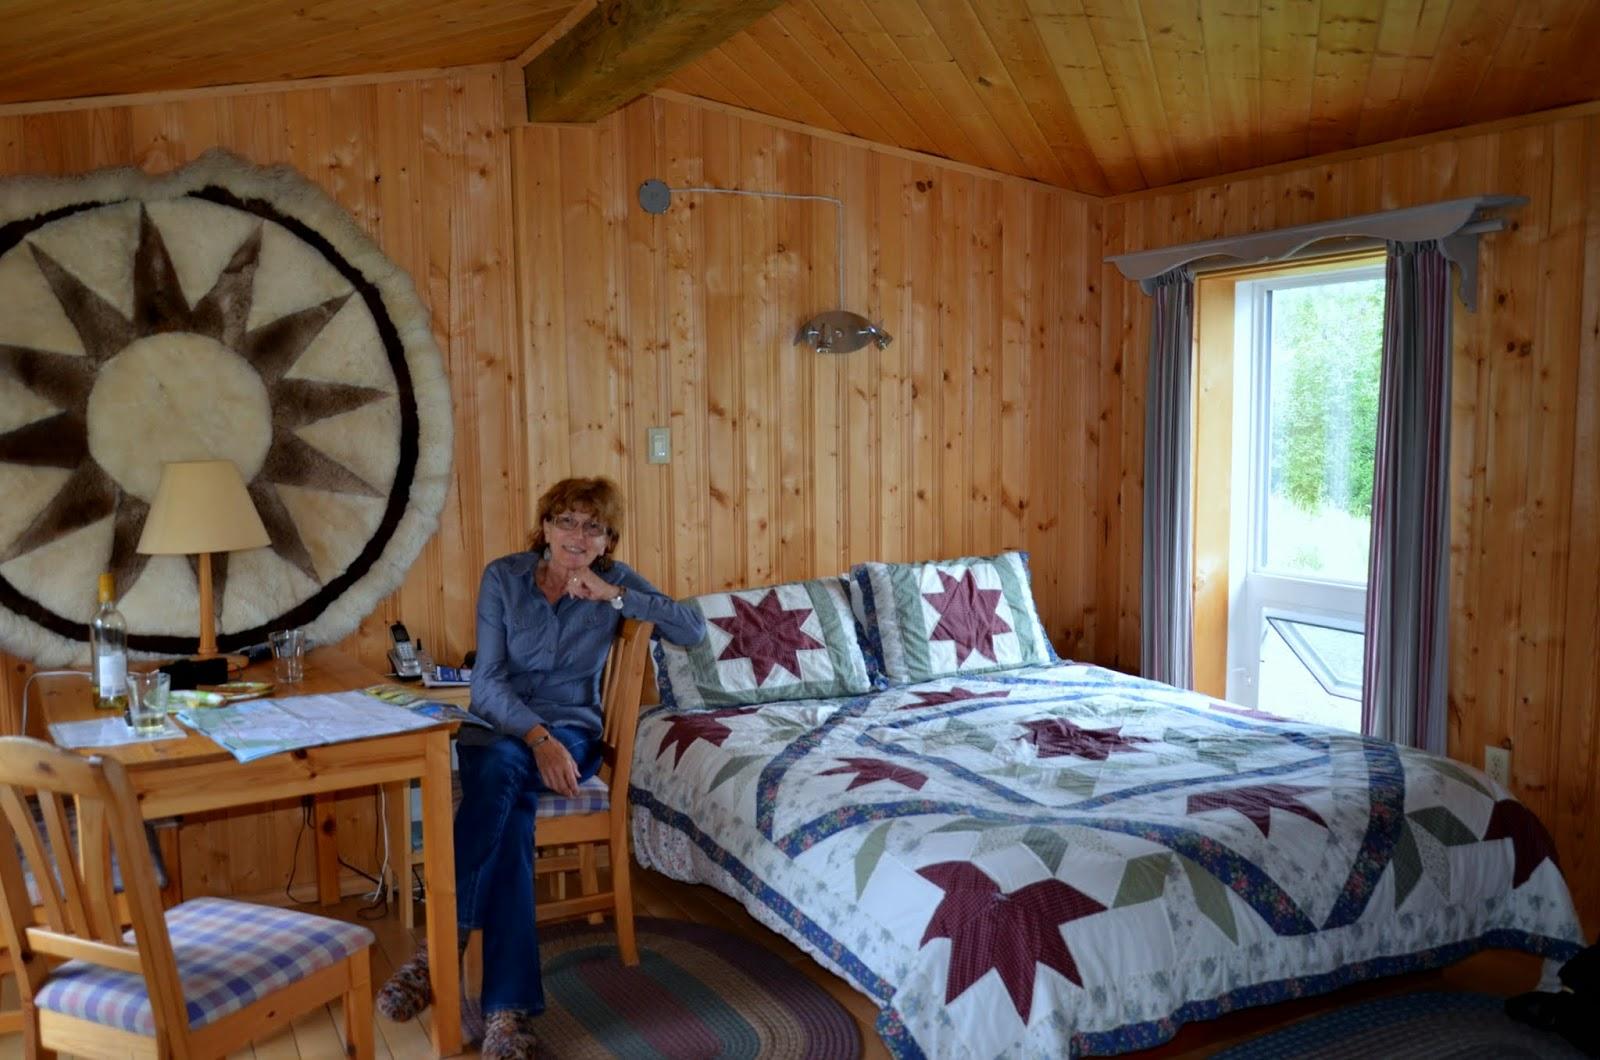 Liz inside cabin.